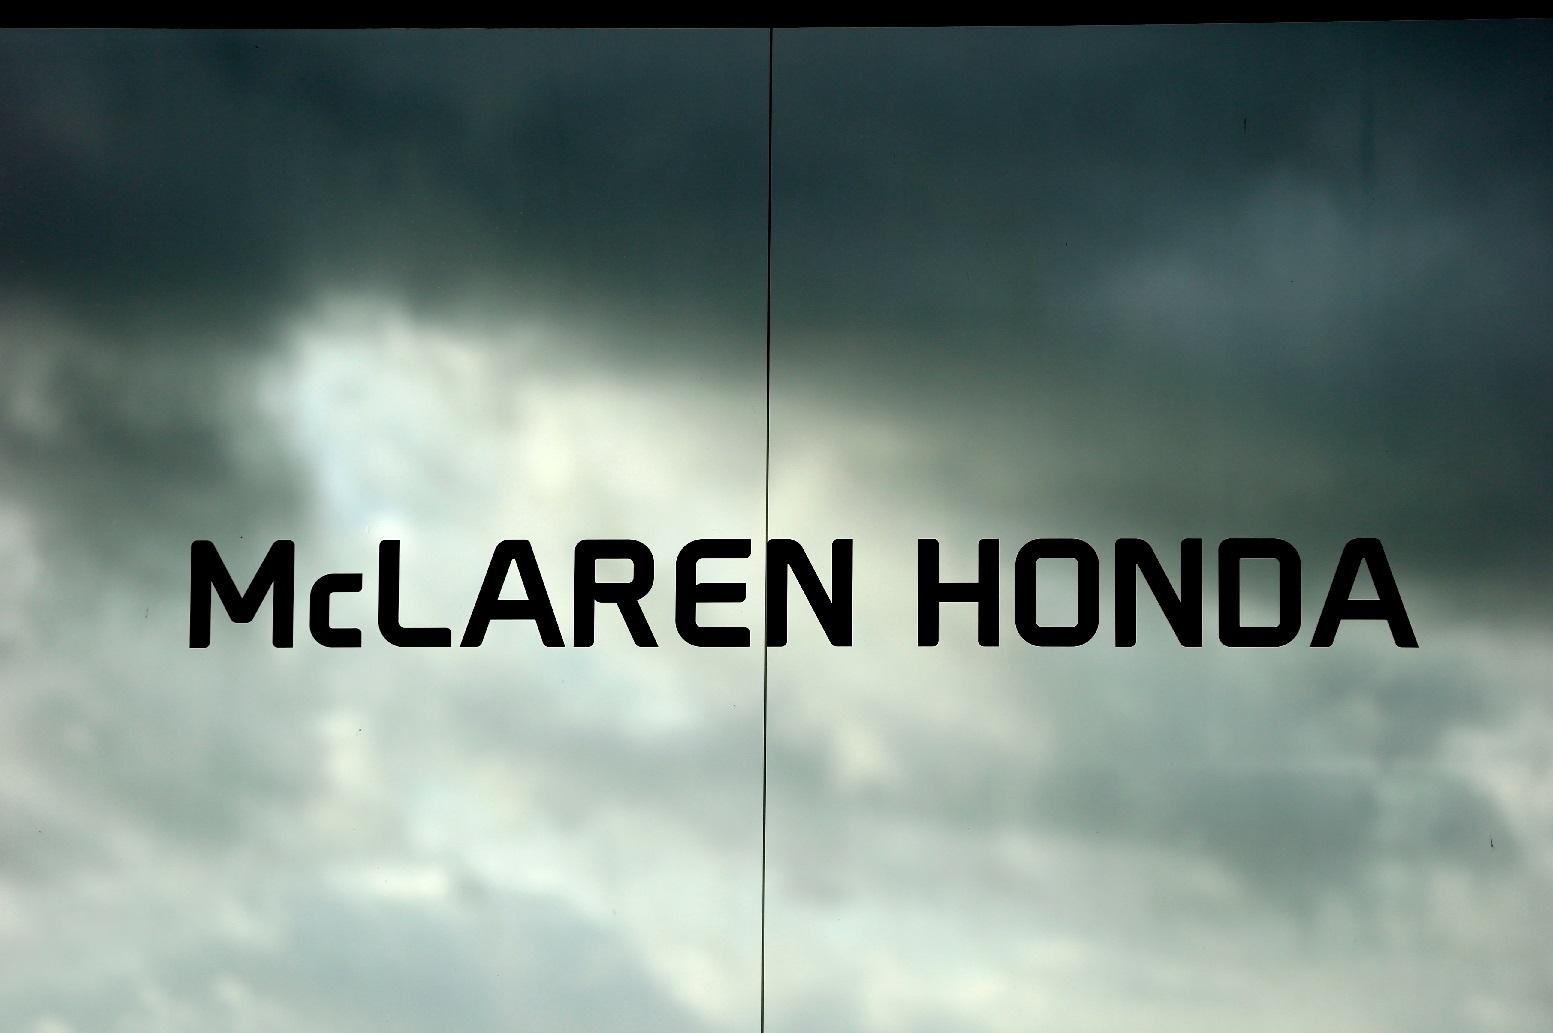 Why McLaren should not ditch Honda